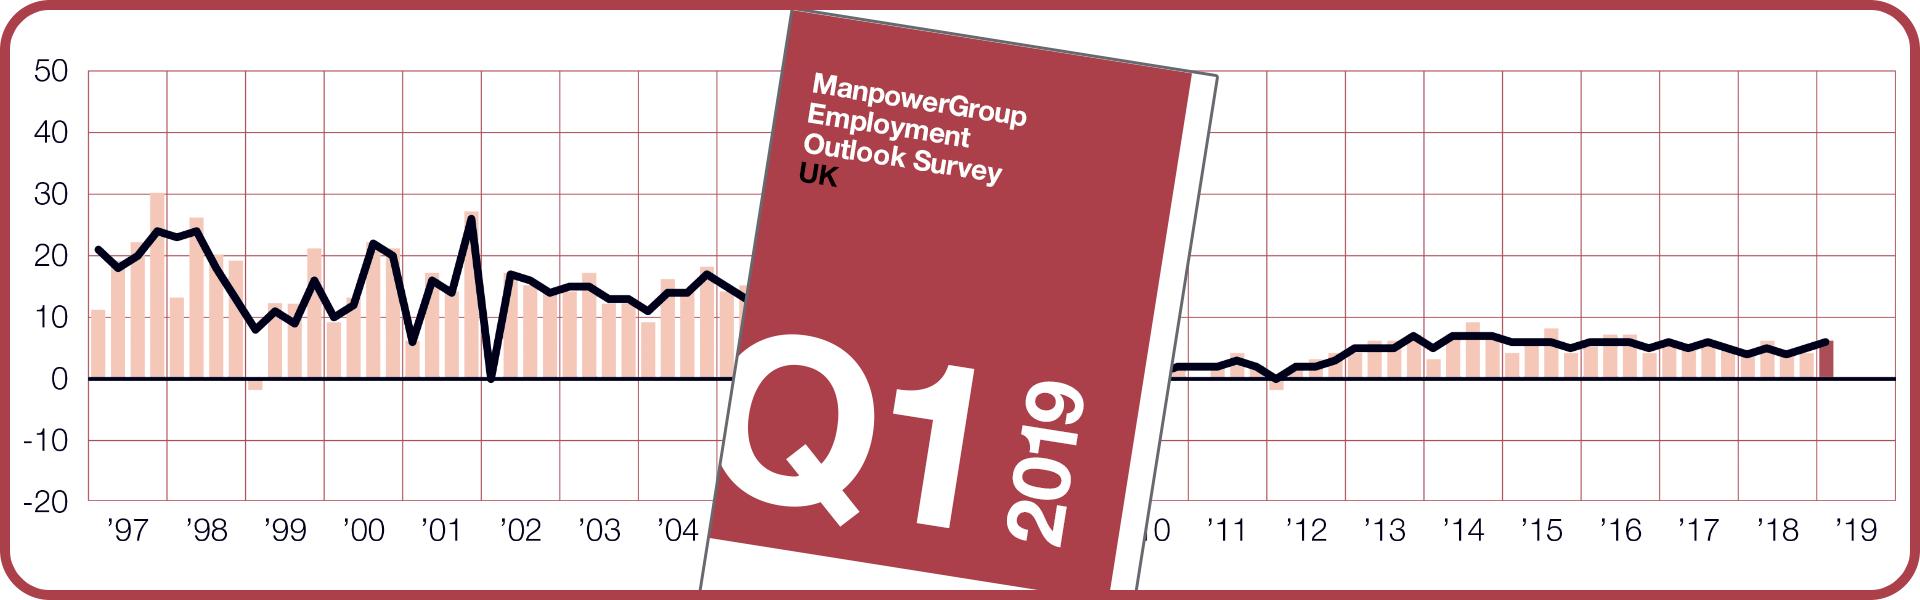 ManpowerGroup Employment Outlook Survey - Q1 2019